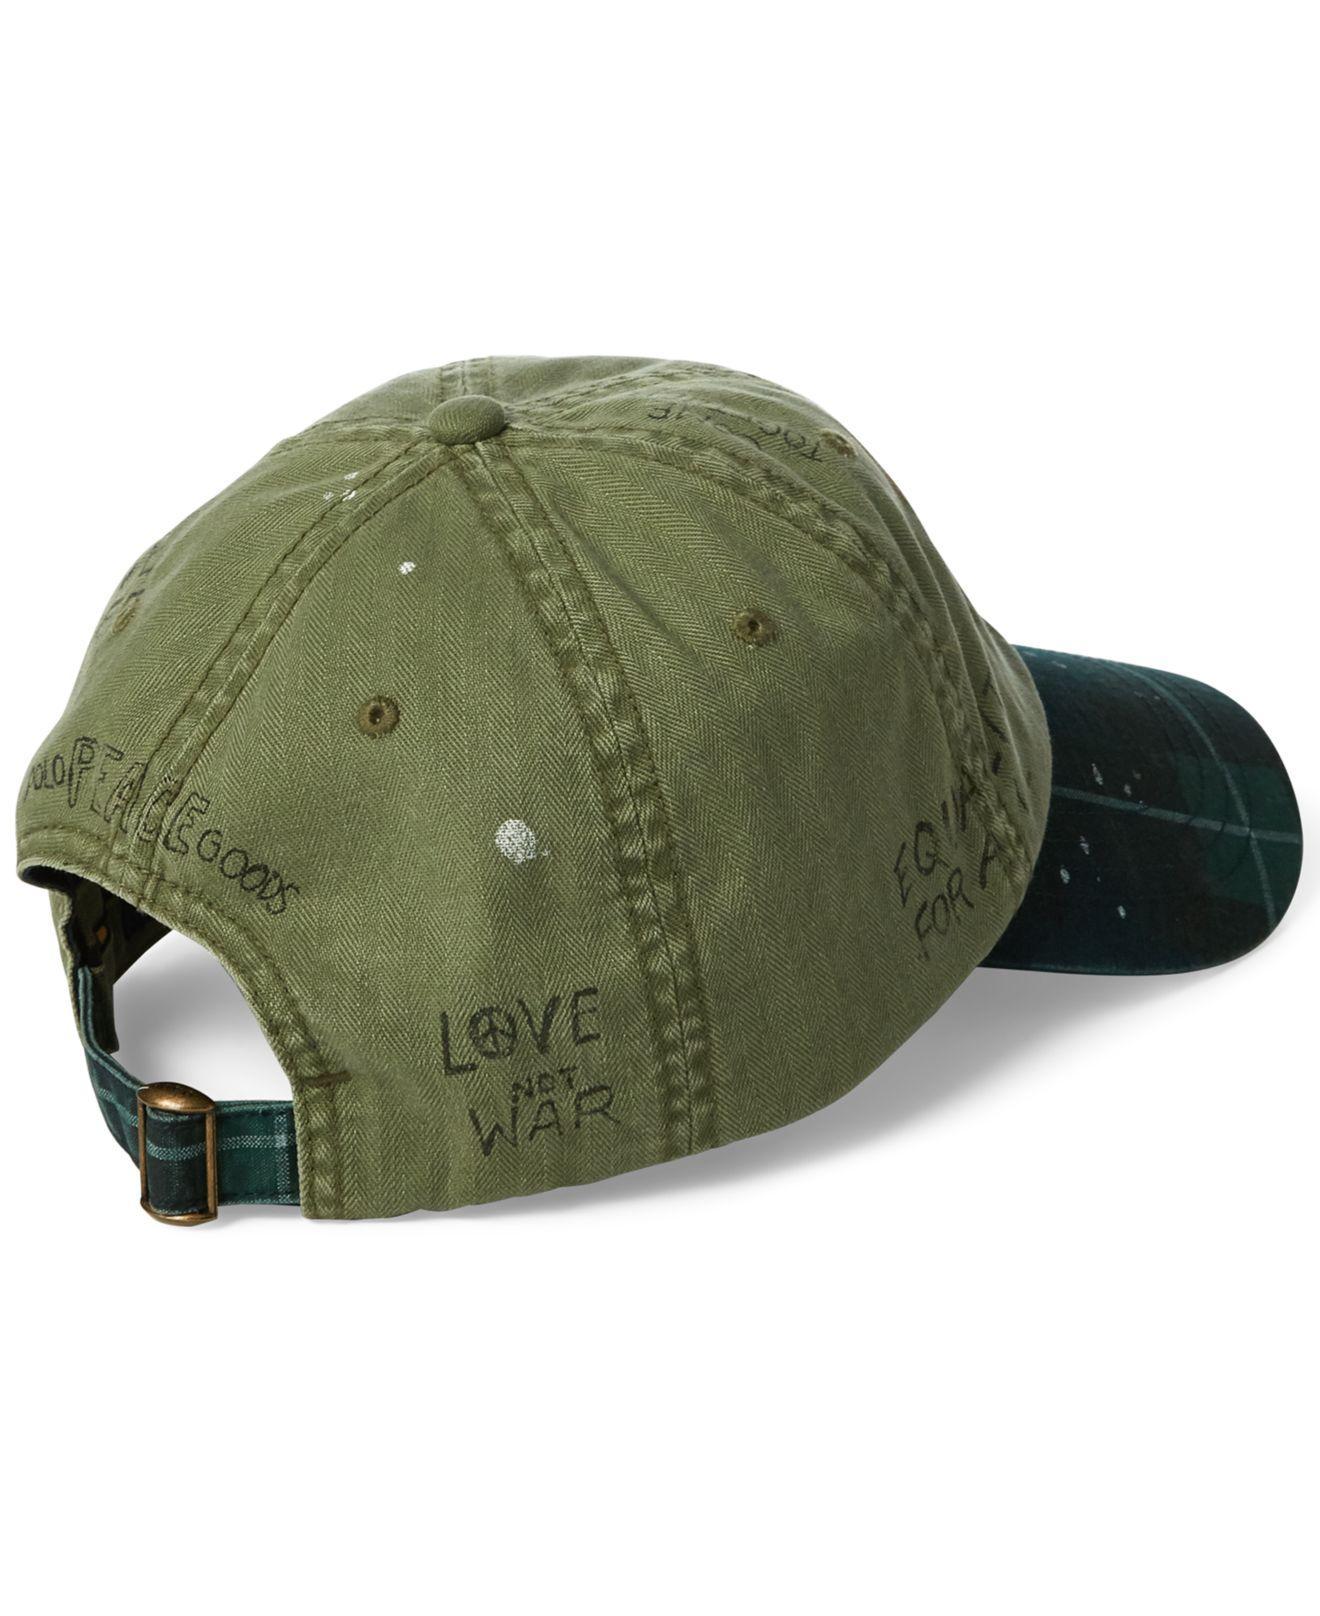 Lyst - Polo Ralph Lauren Paint-splatter Crested Cap in Green for Men 2a69ddf6ccf9